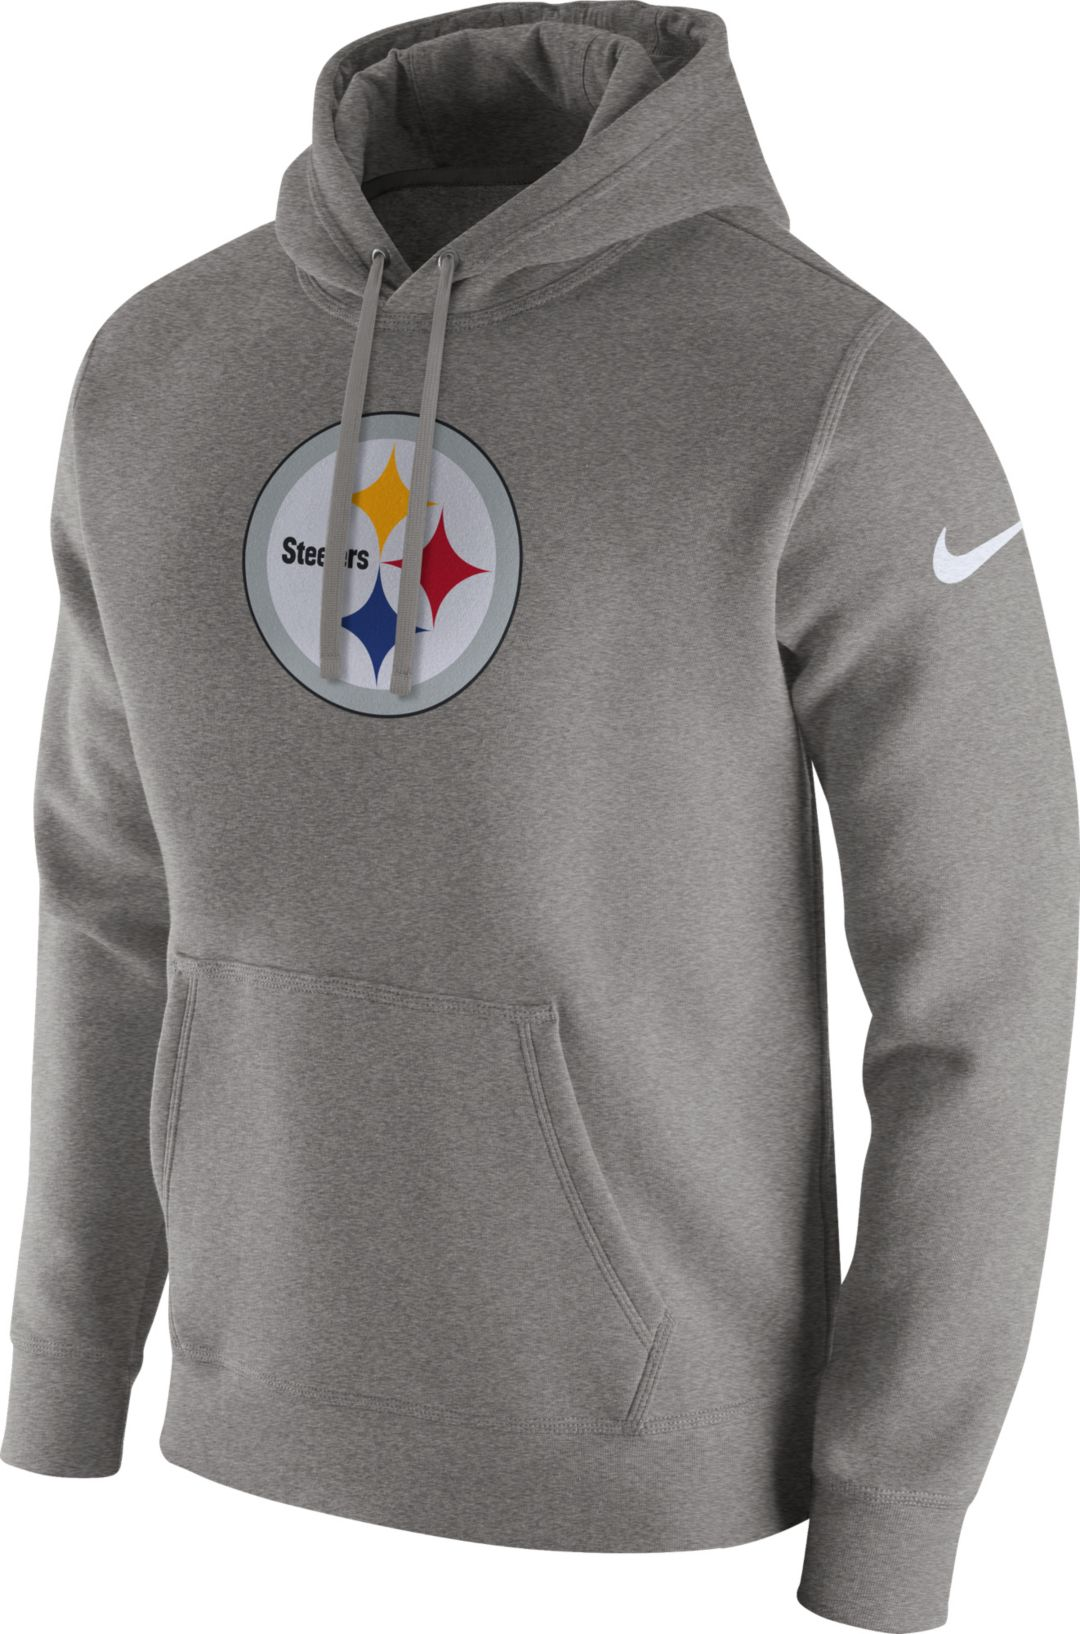 4199a2a7 Nike Men's Pittsburgh Steelers Logo Club Grey Hoodie